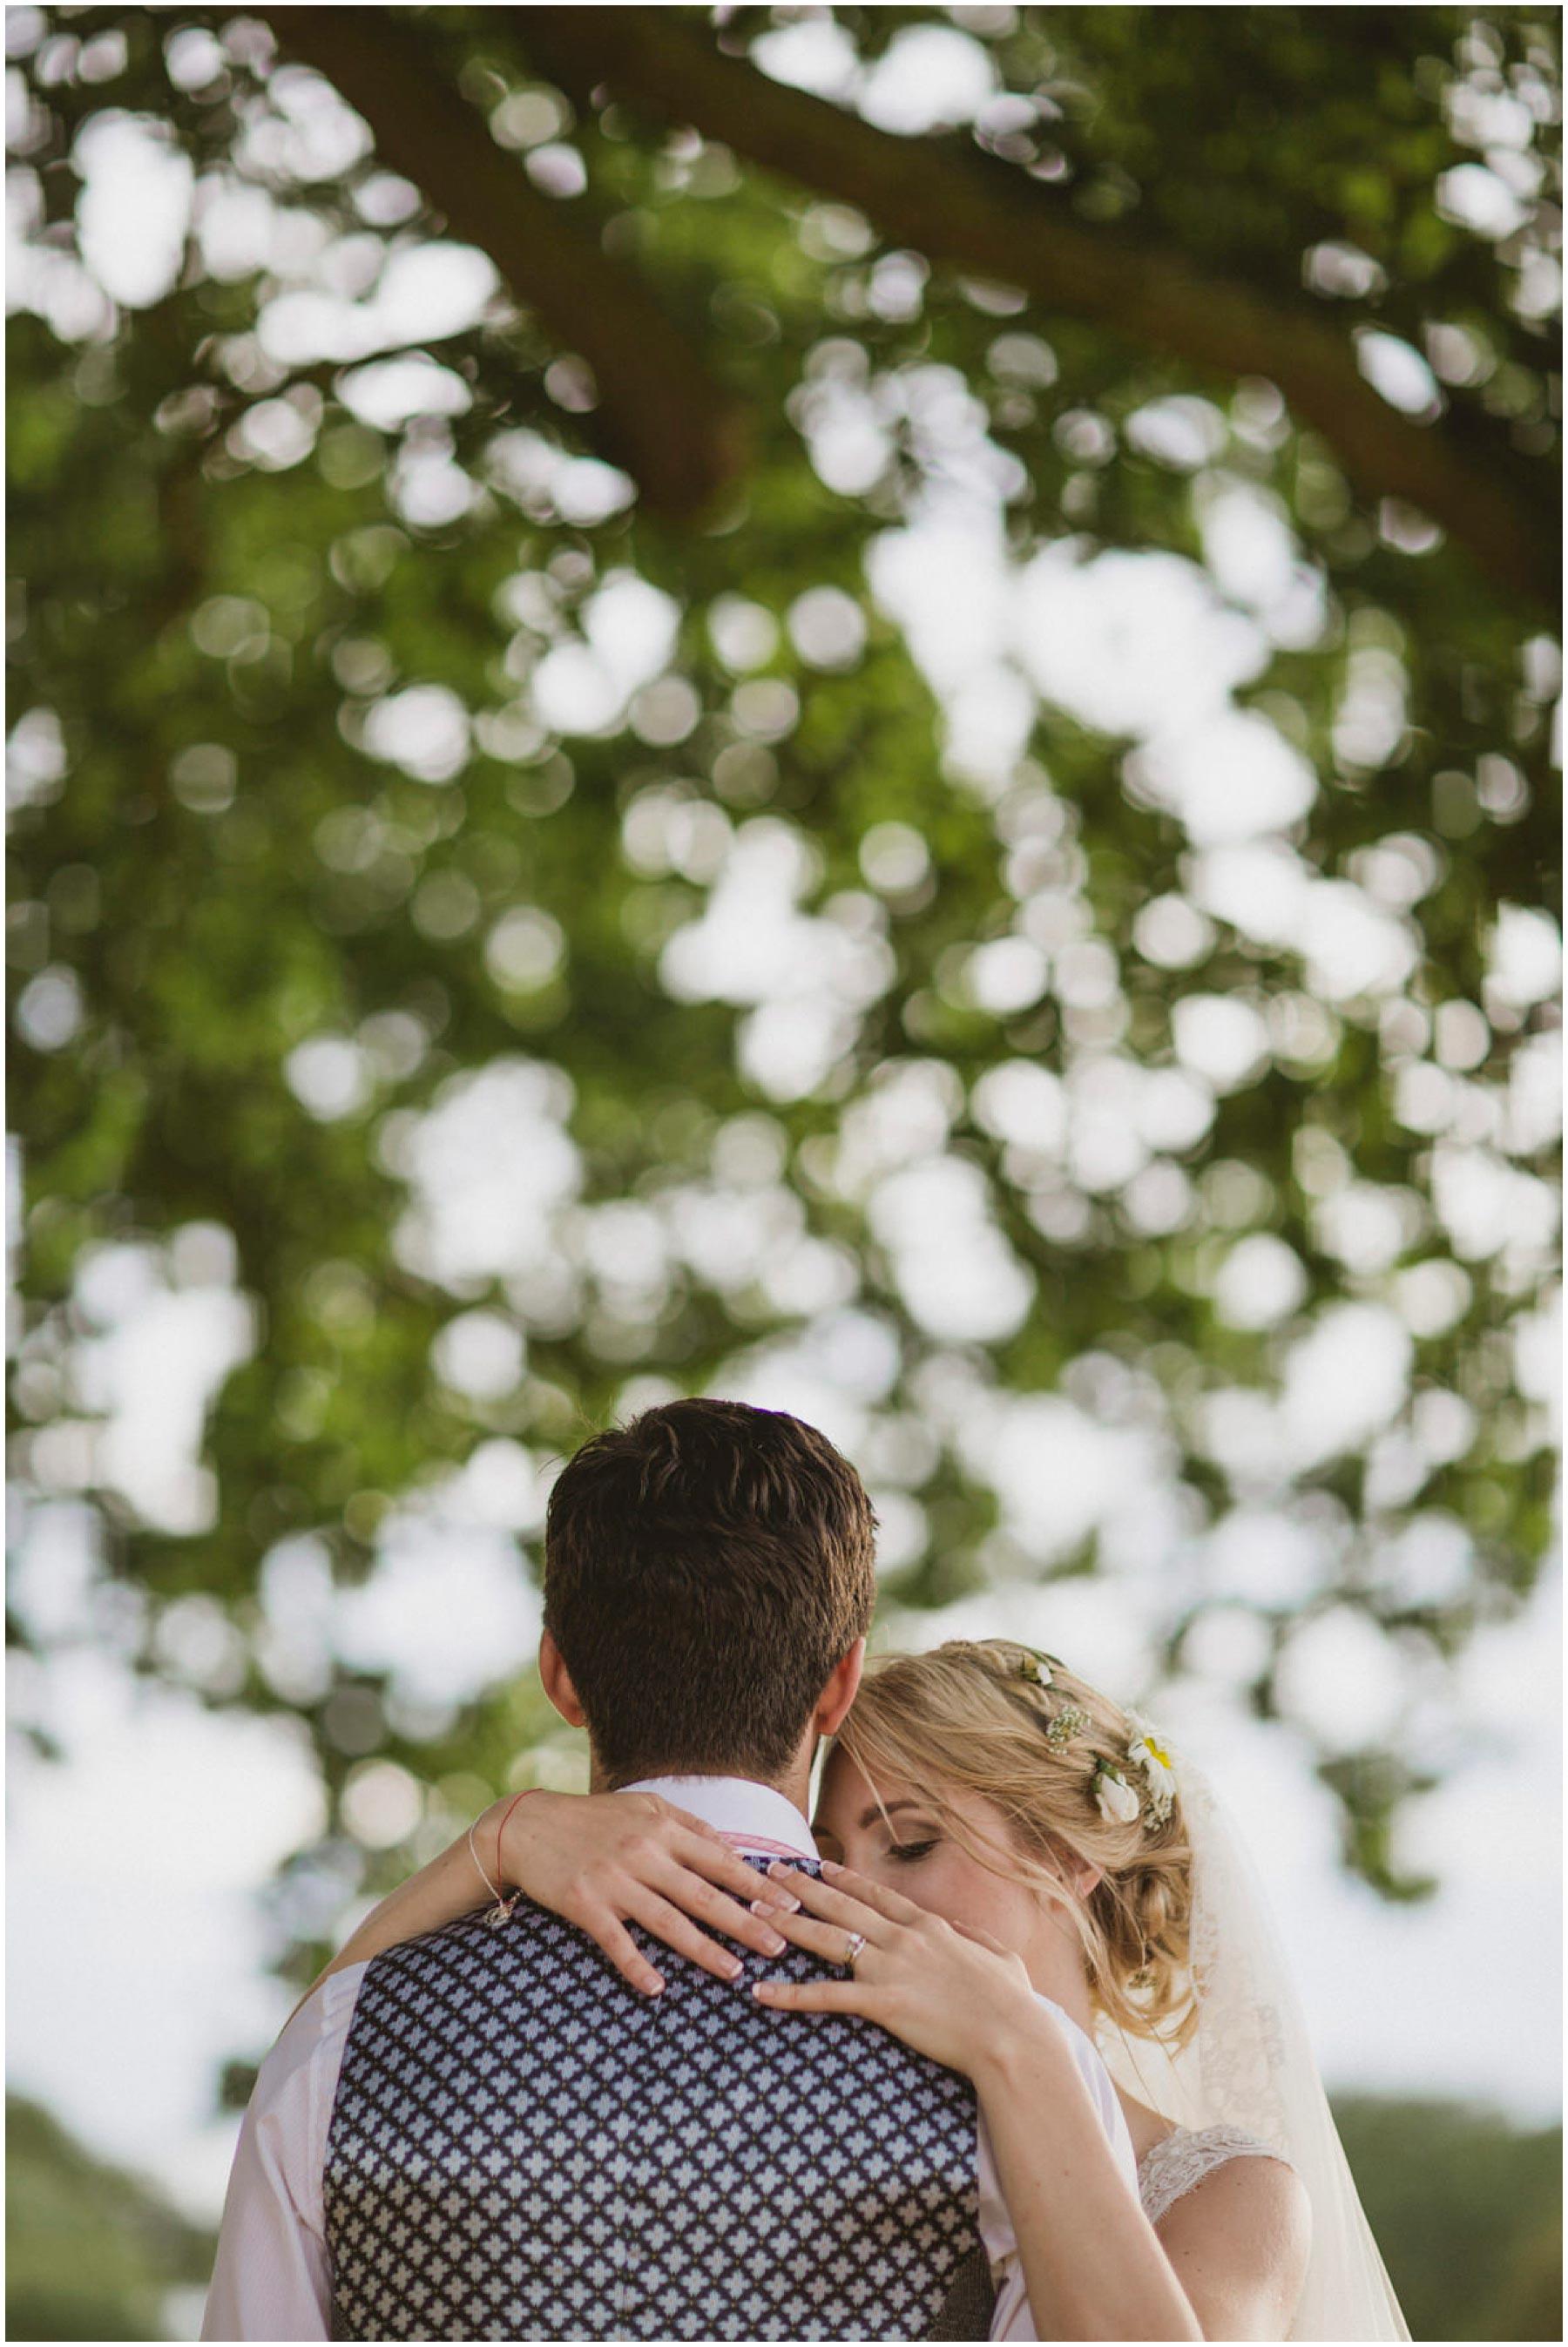 Kent-Festival-Tipi-wedding-photography_0134